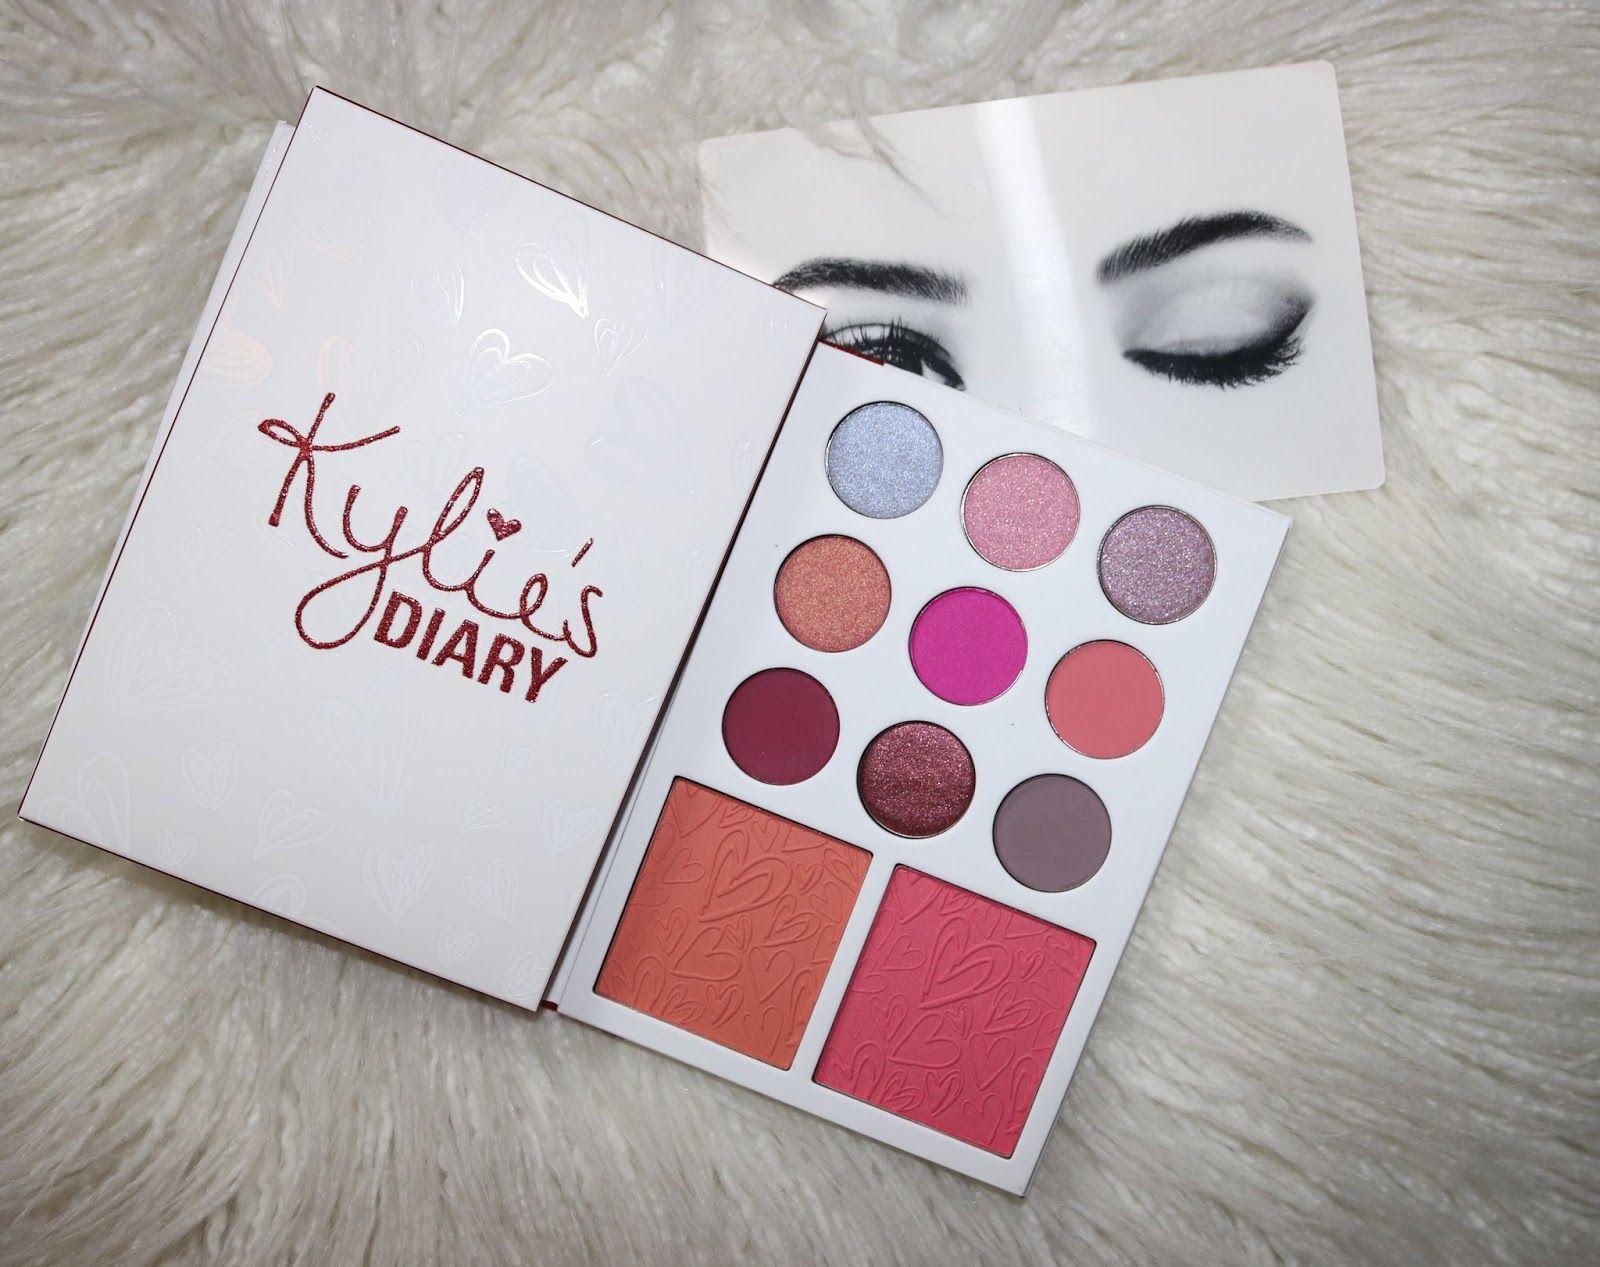 18c7183d70e Kylie Cosmetics Kylie's diary | www.cocochanellie.com | | My Makeup ...